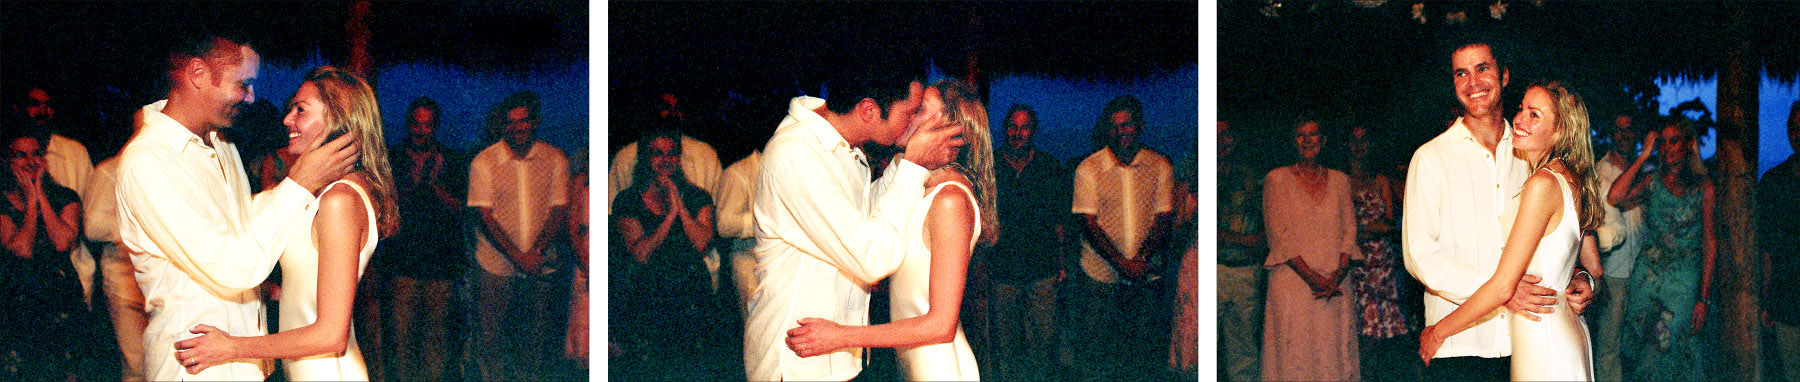 Wedding_Sayulita_Mexico_35_36_37